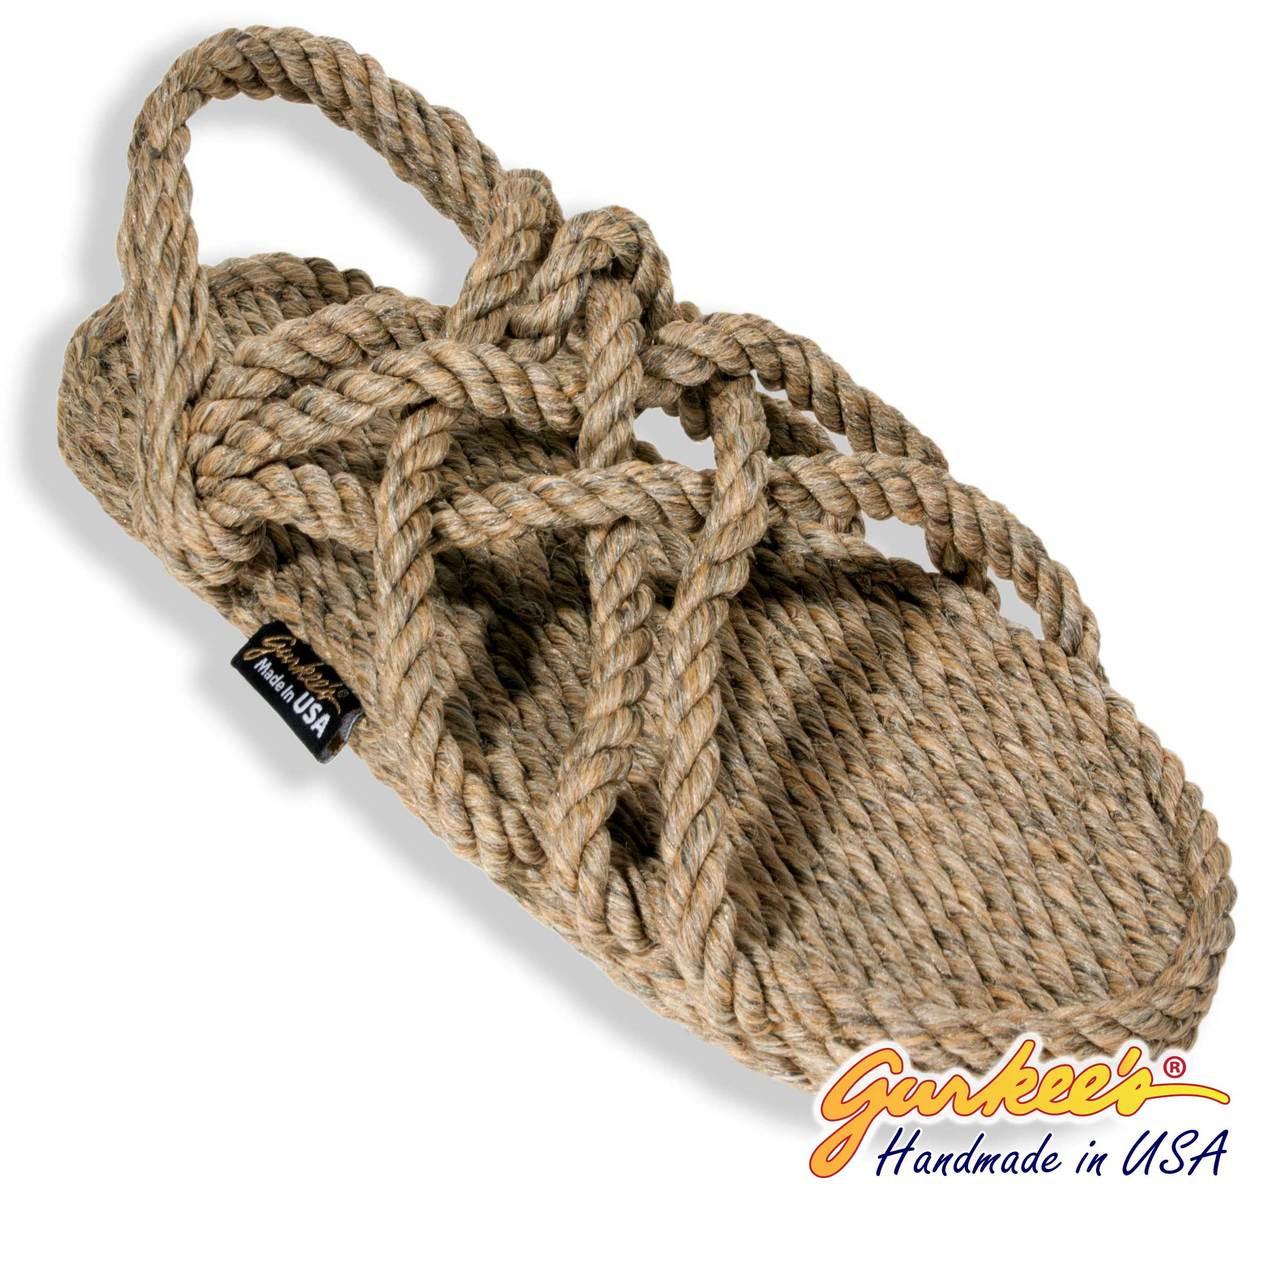 0d4cffff921130 Signature neptune hemp color rope sandals gurkees jpg 1280x1280 His rope  sandals